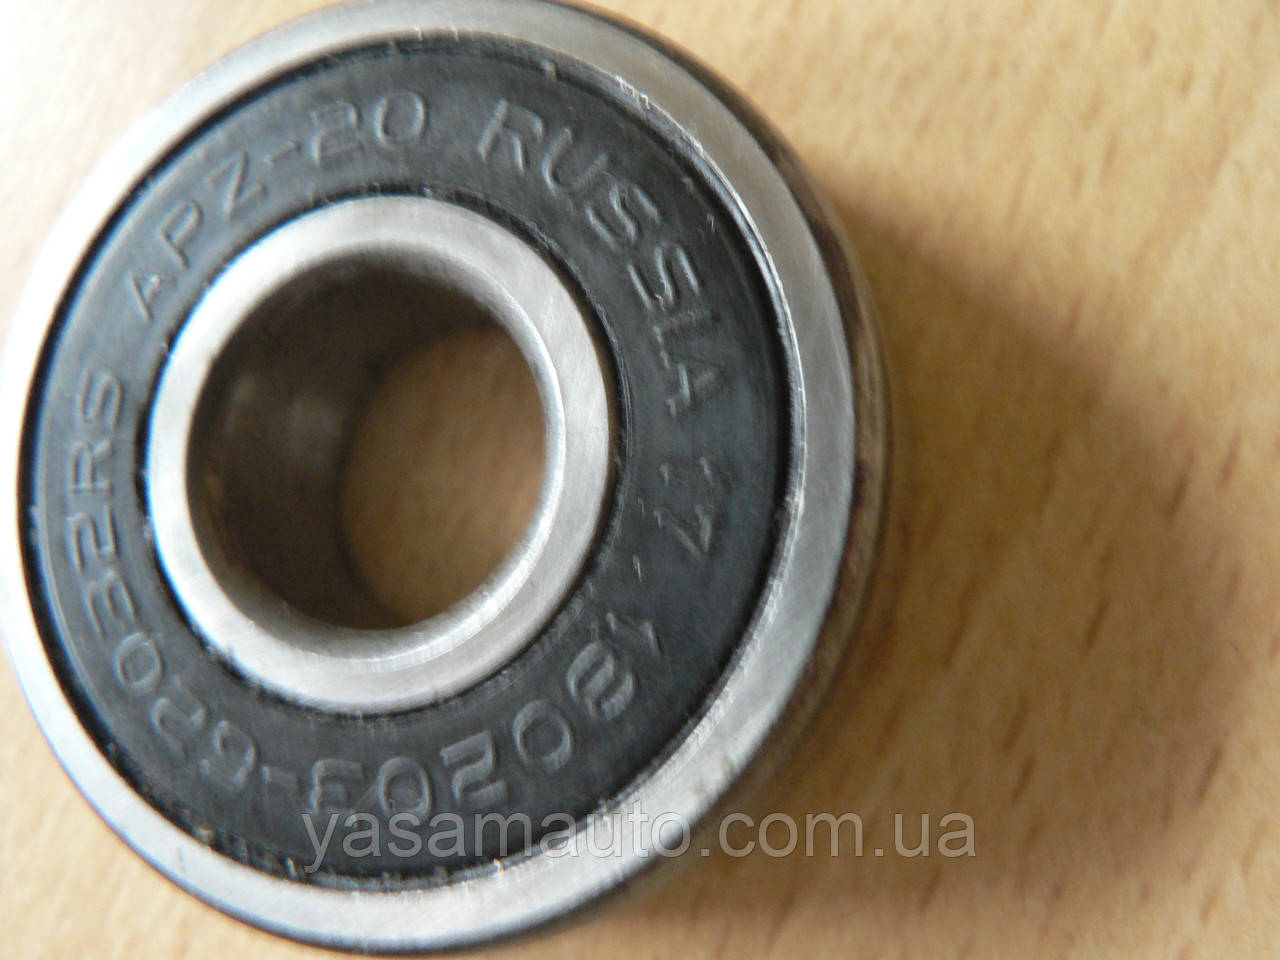 Подшипник 180203 - 6203 2RS шариковый закрытый D=42мм d=15мм h=13мм Россия АПЗ 20